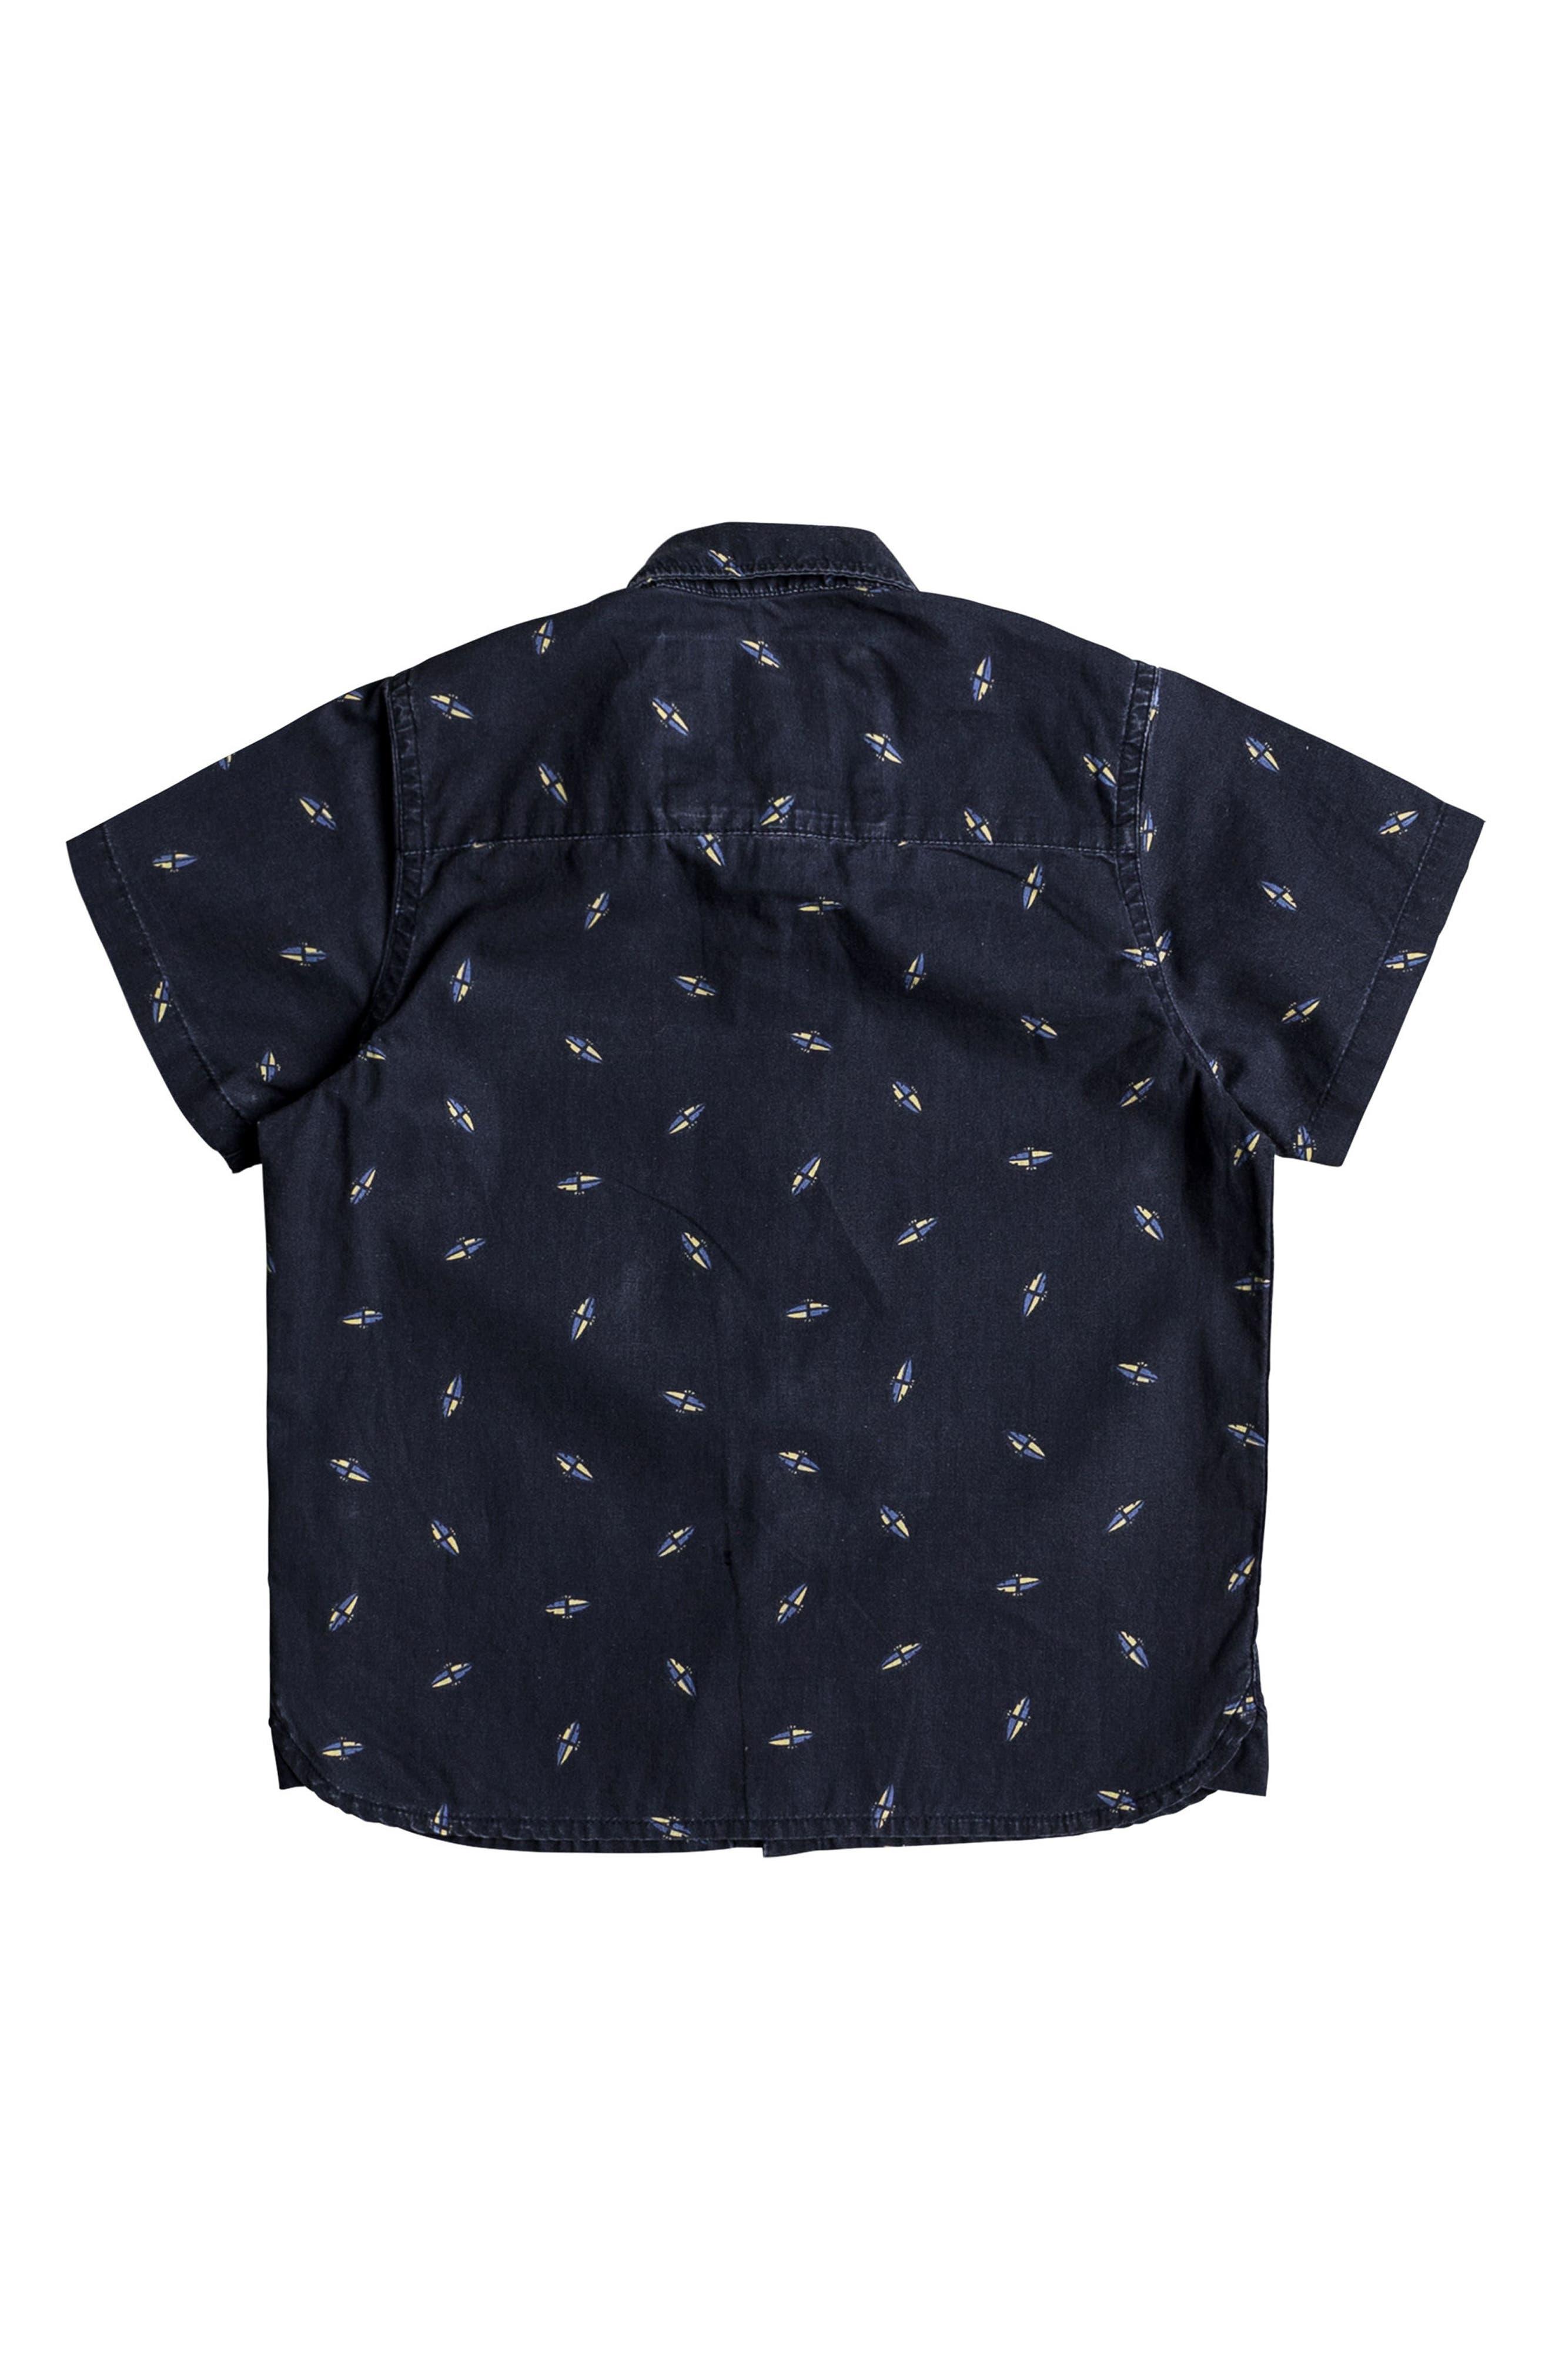 Boredsnap Woven Shirt,                             Alternate thumbnail 2, color,